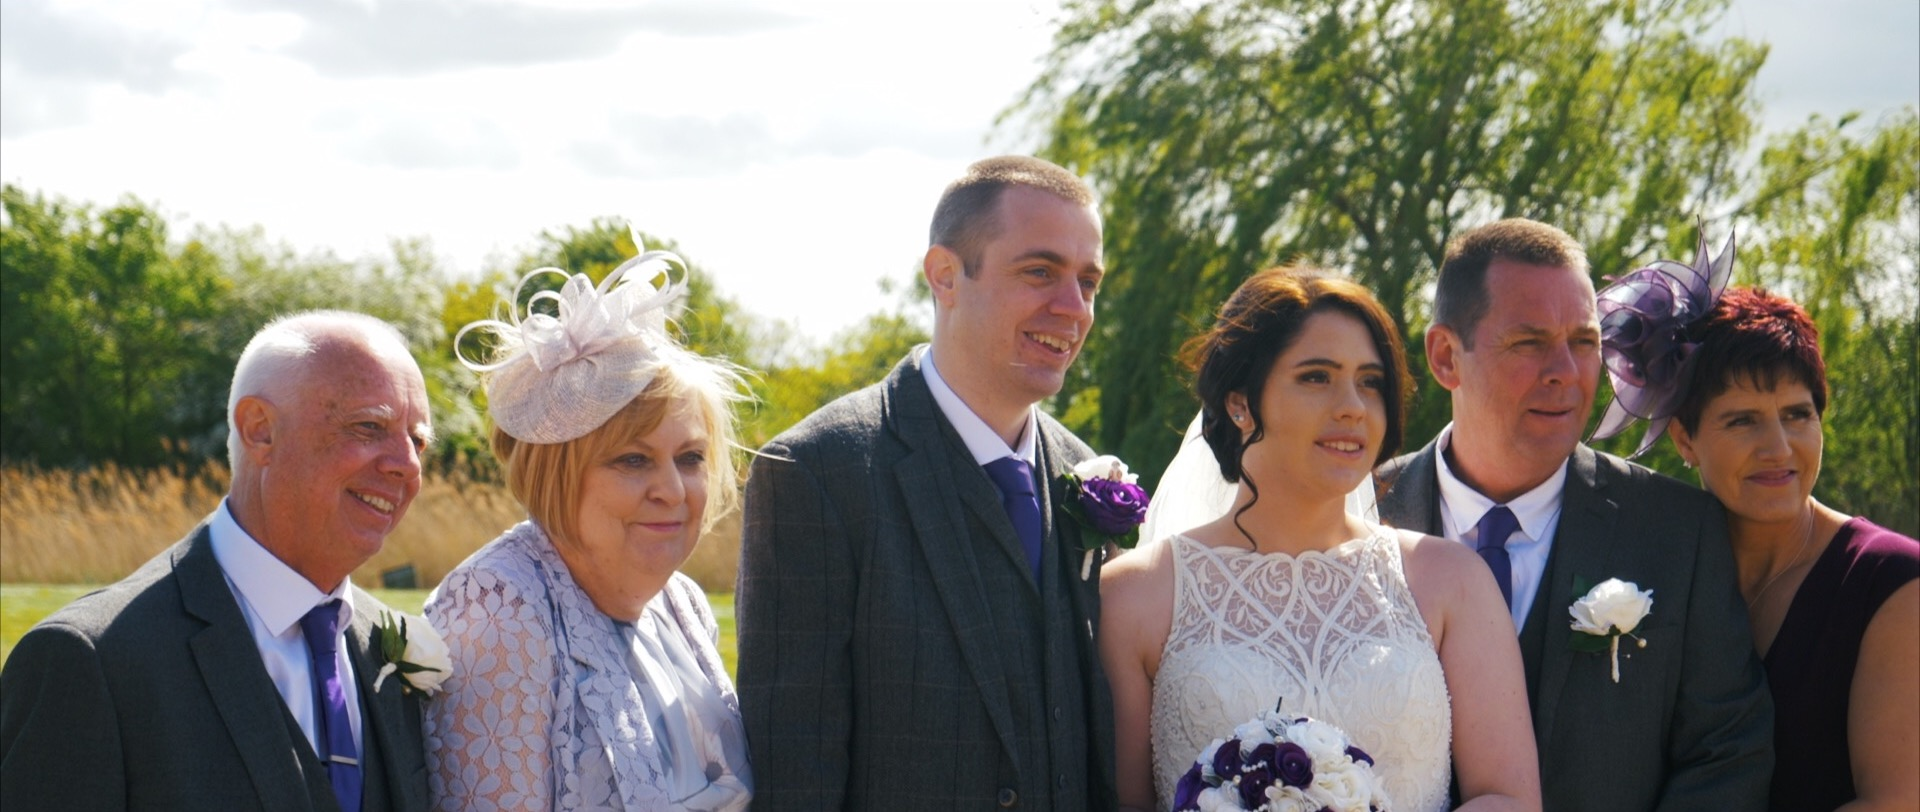 Cromwell Manor Wedding Photos.jpg